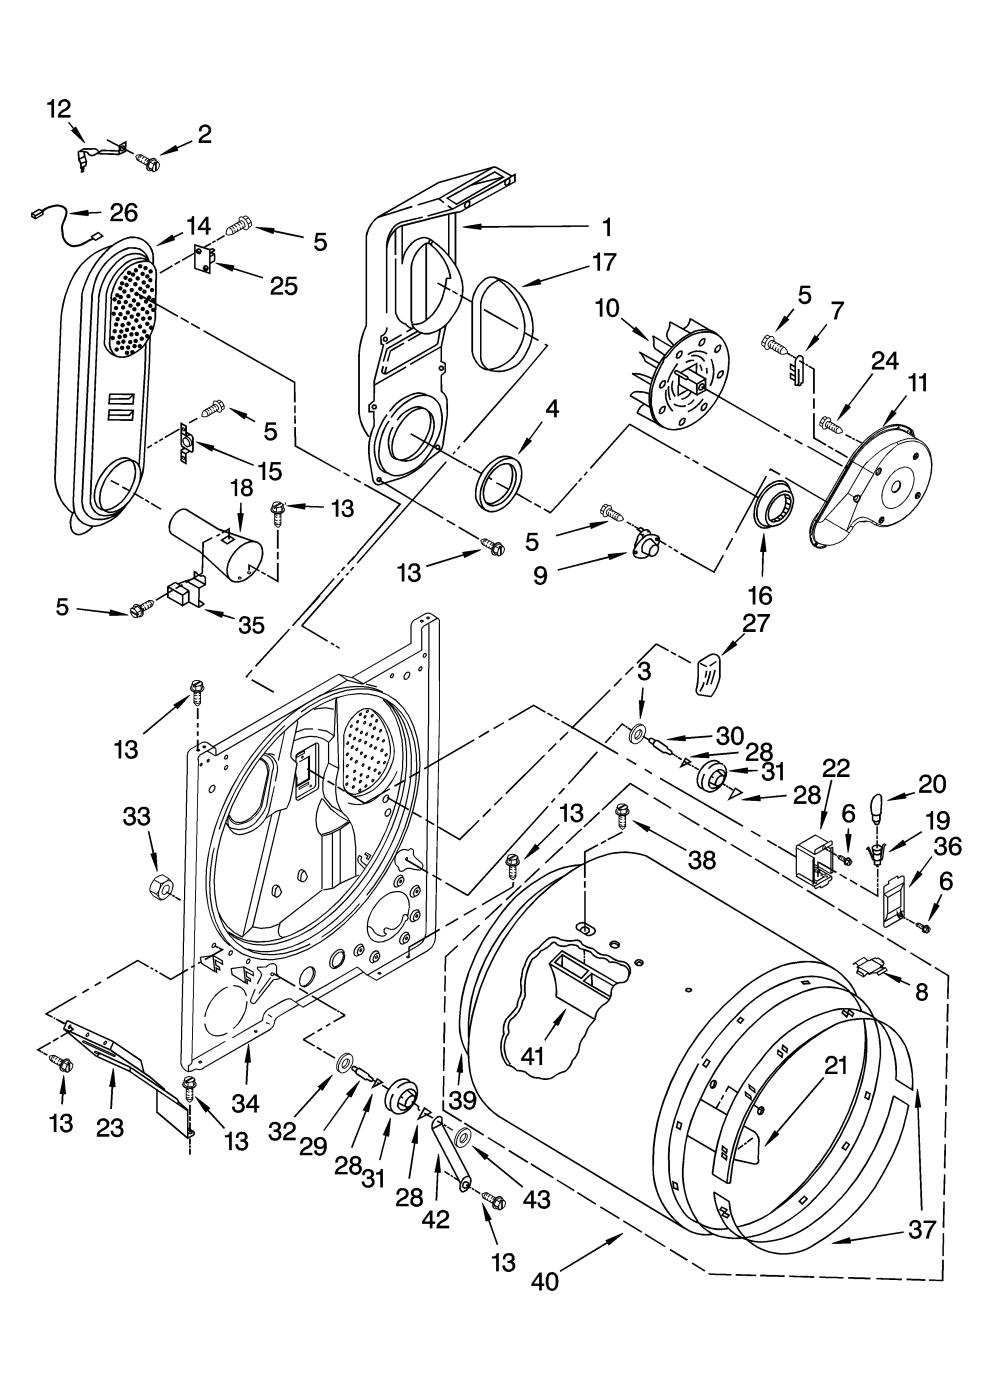 medium resolution of whirlpool dryer parts photos